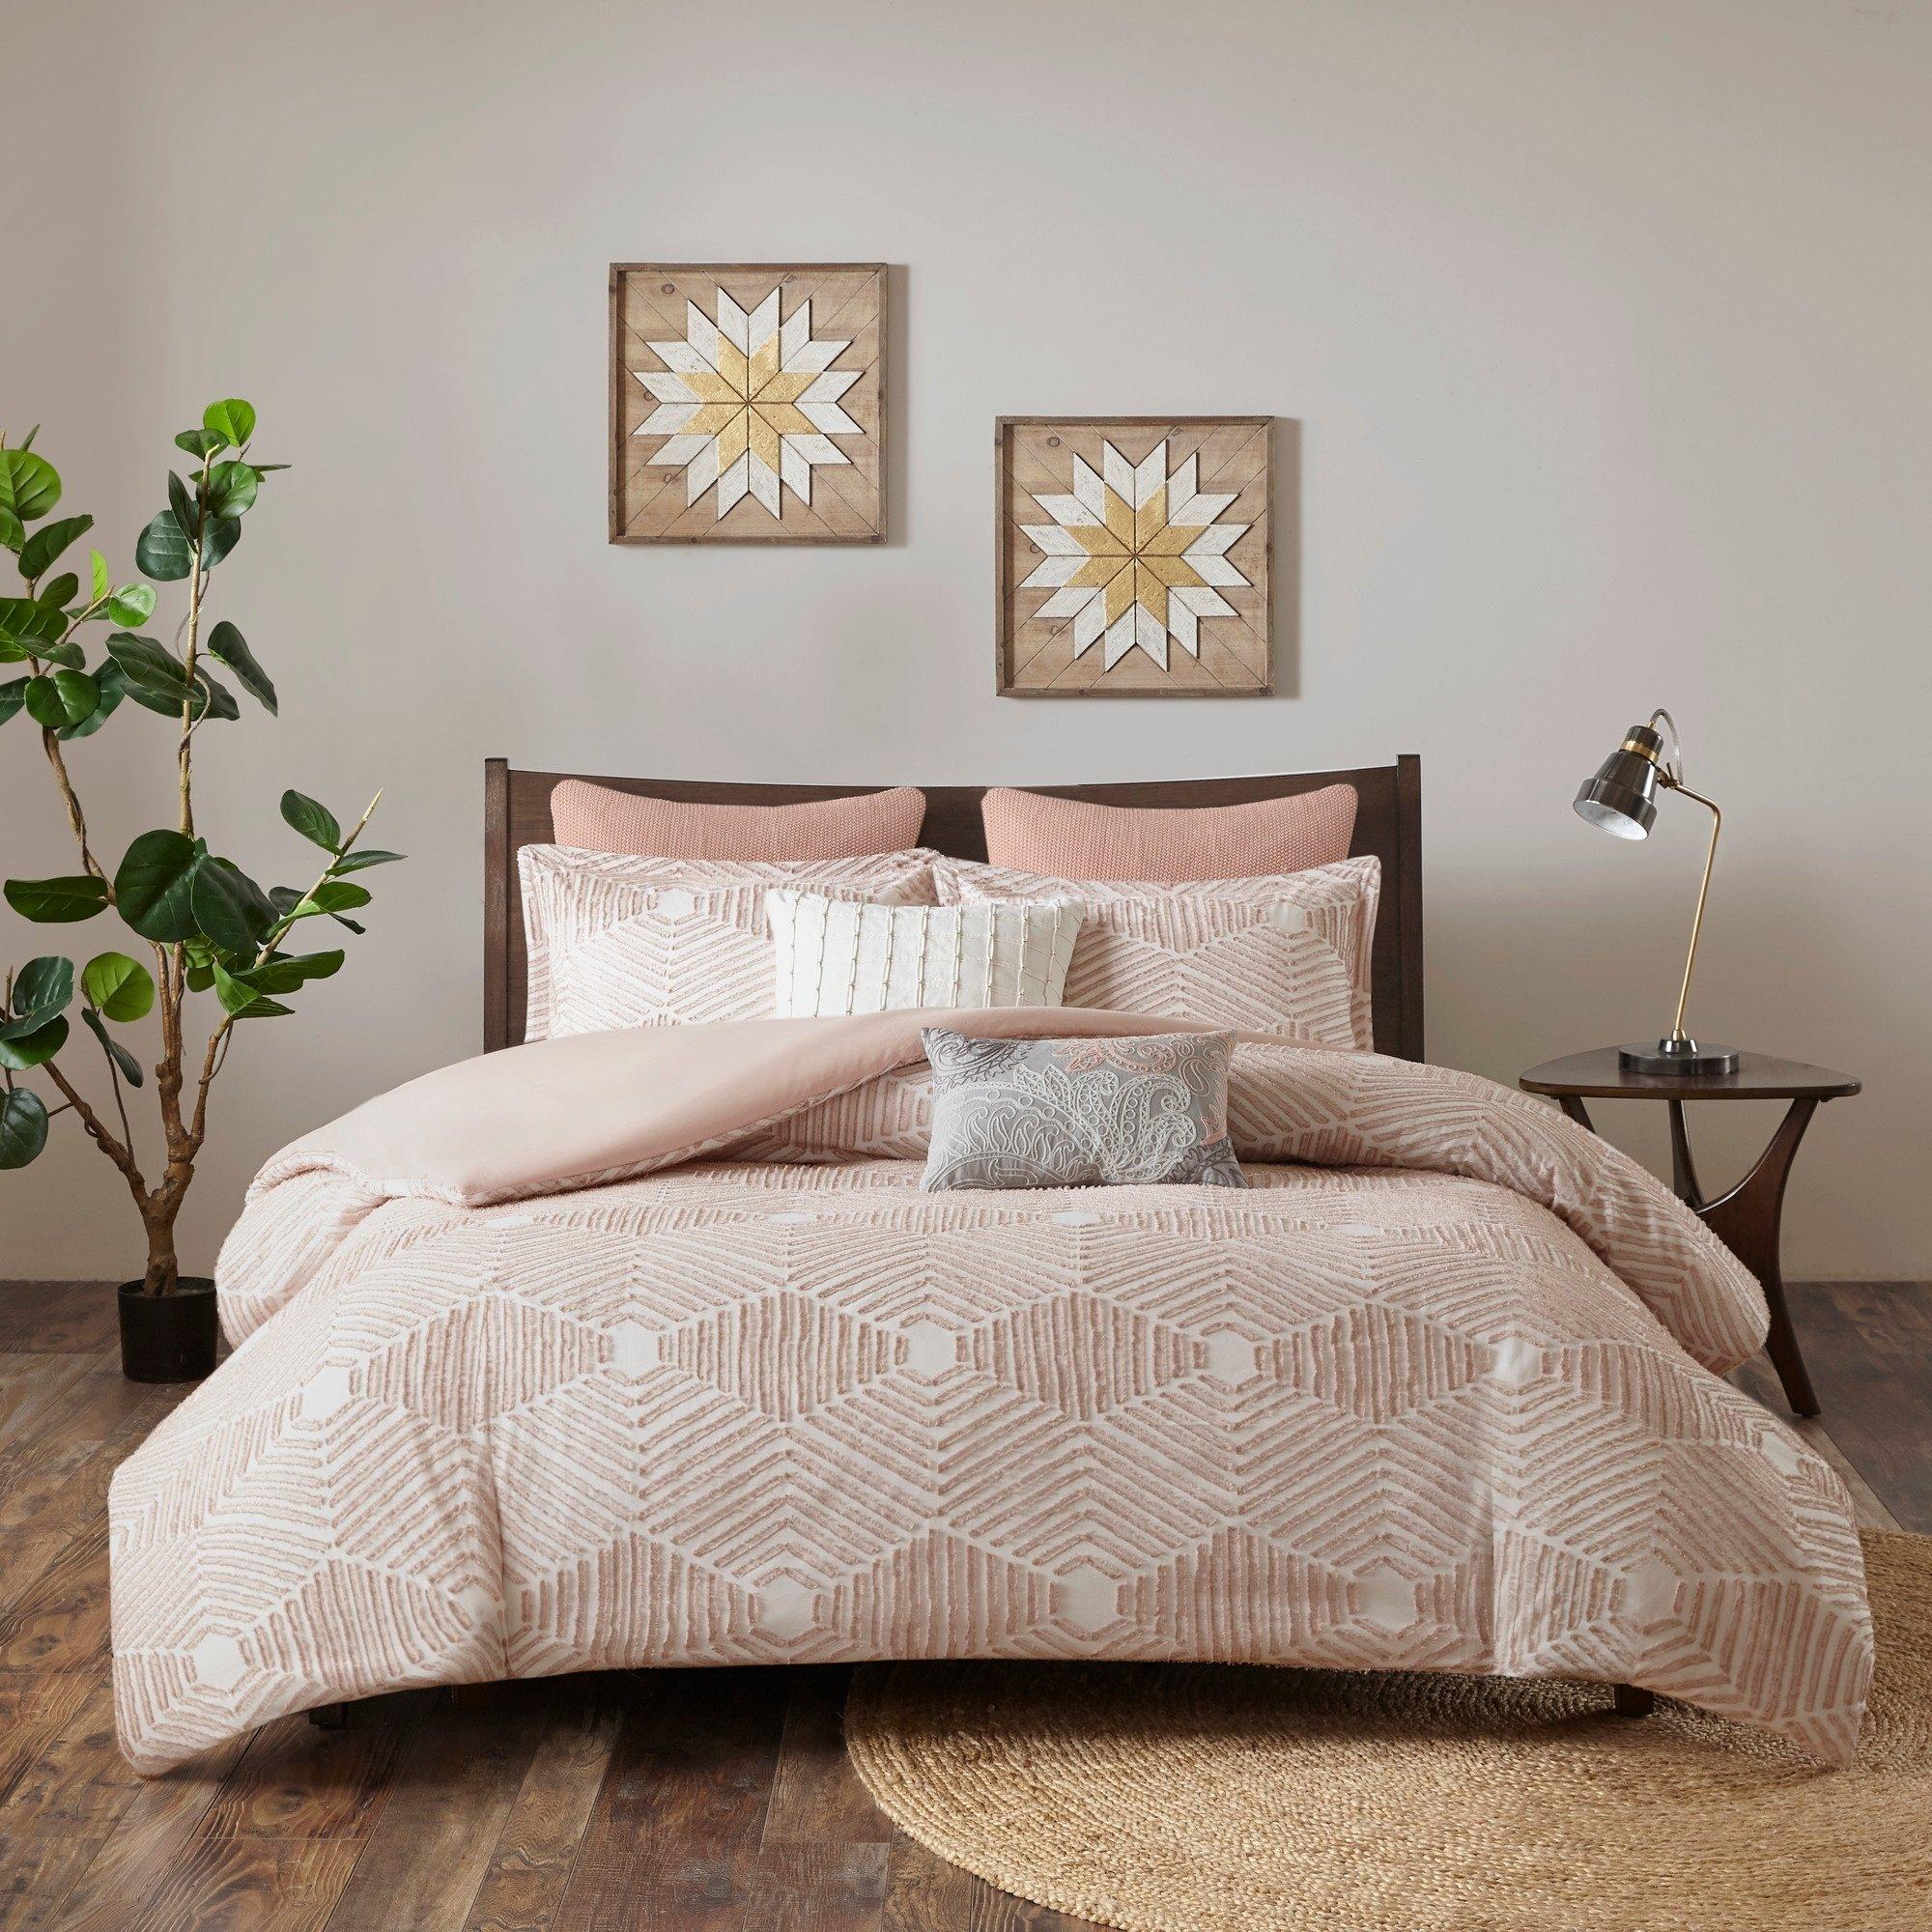 Ink Ivy Ellipse Blush Cotton Jacquard Comforter Set Textured Geometric Full Queen Shabby Chic Mo Comforter Sets Duvet Cover Sets Reversible Duvet Covers